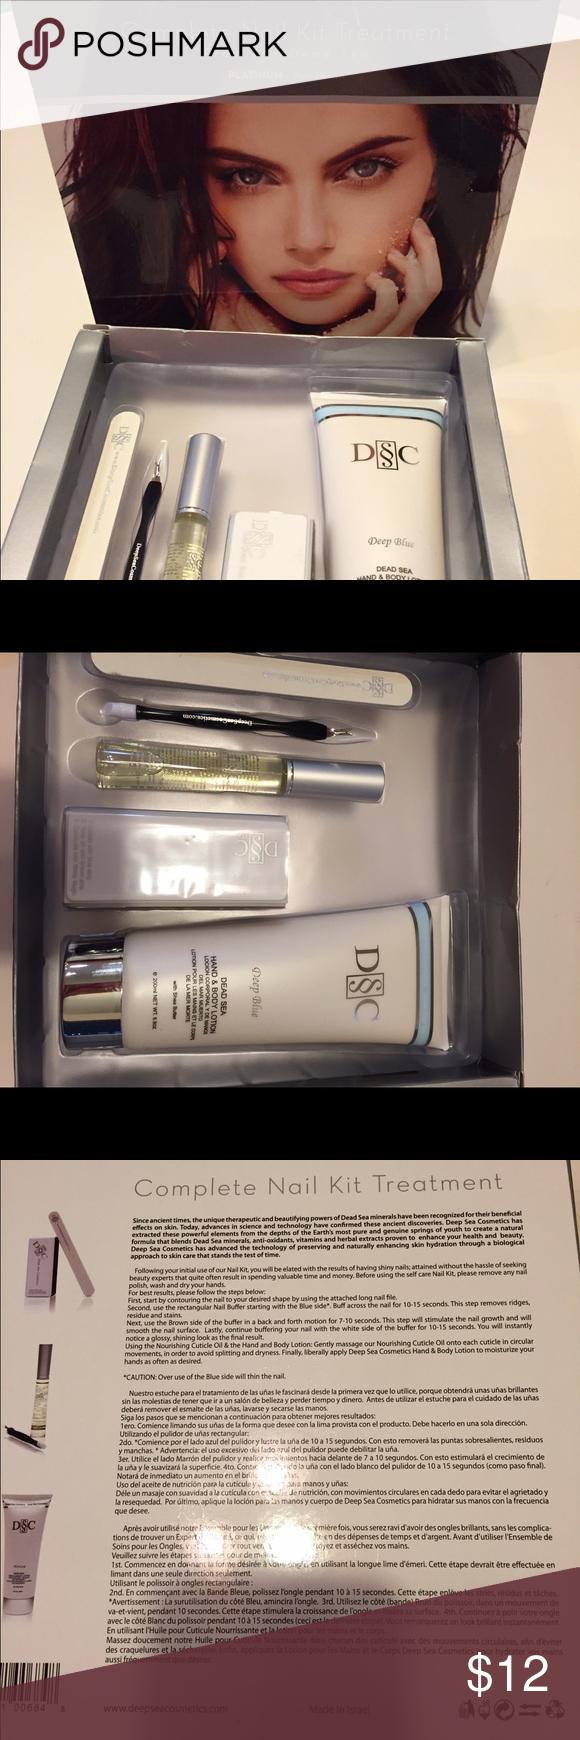 Deep Sea Cosmetics Nail treatment kit   Deep sea, Cosmetics and Bodies